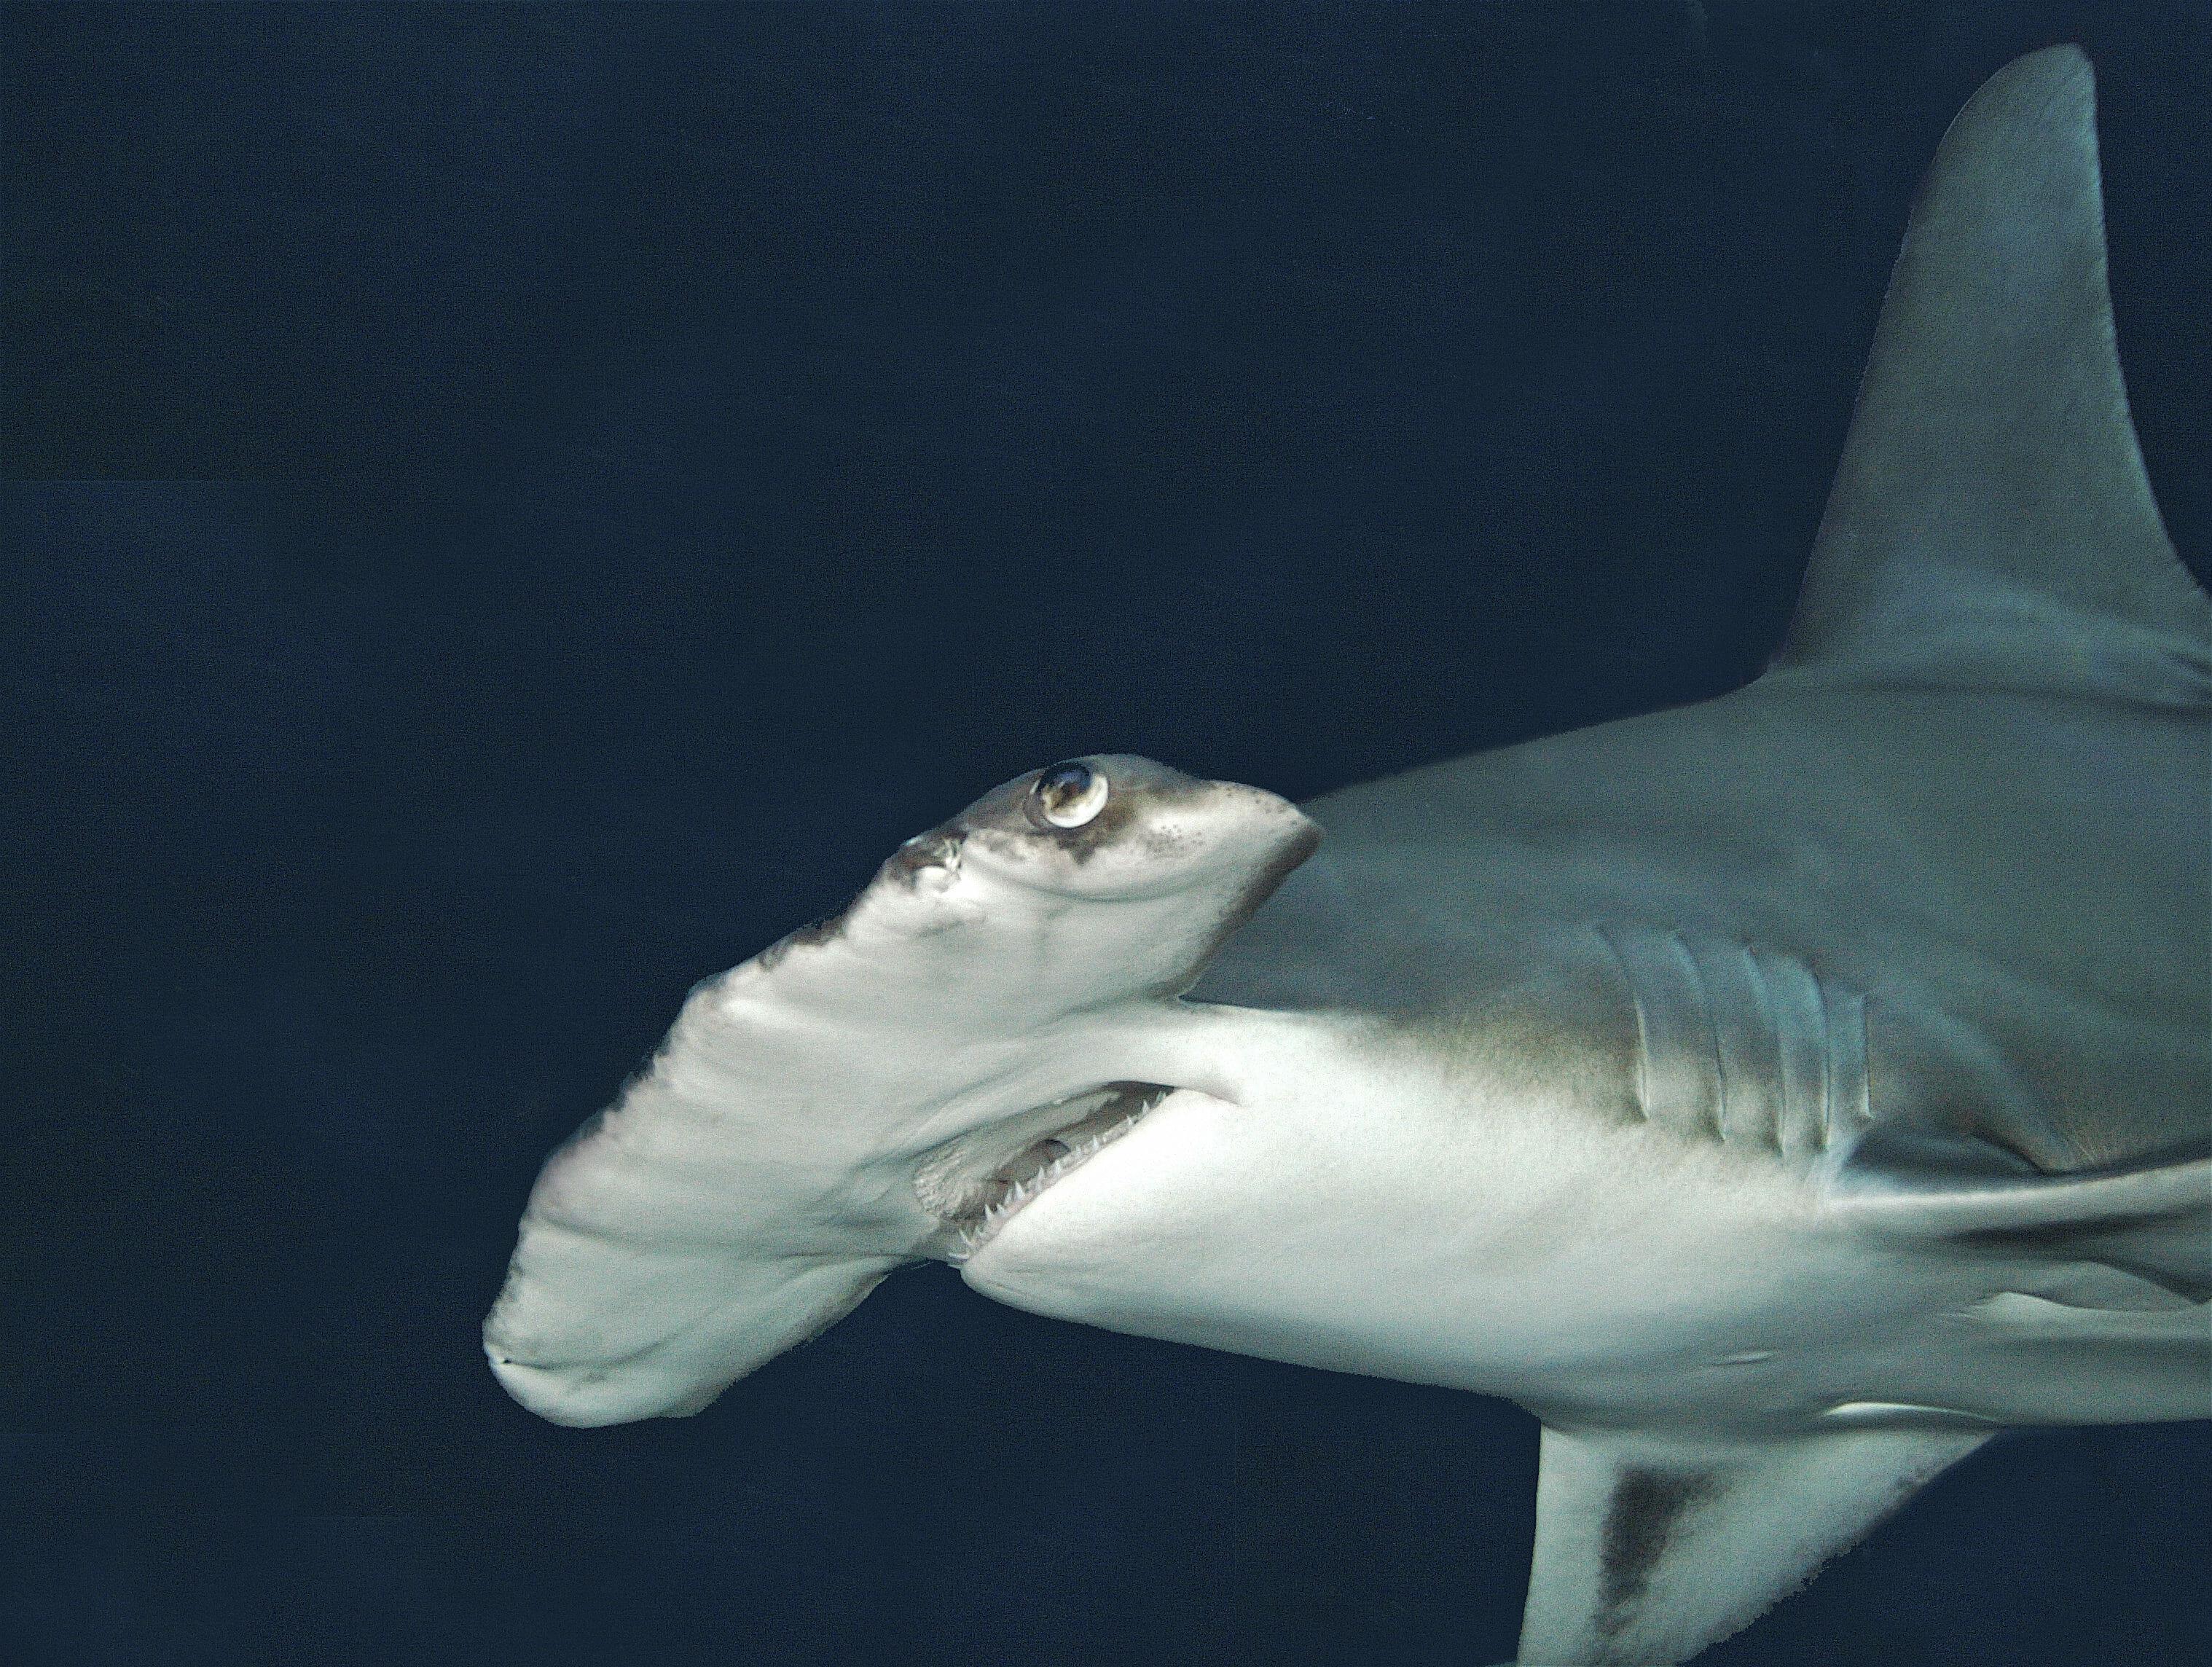 Shark Cage Dive Program